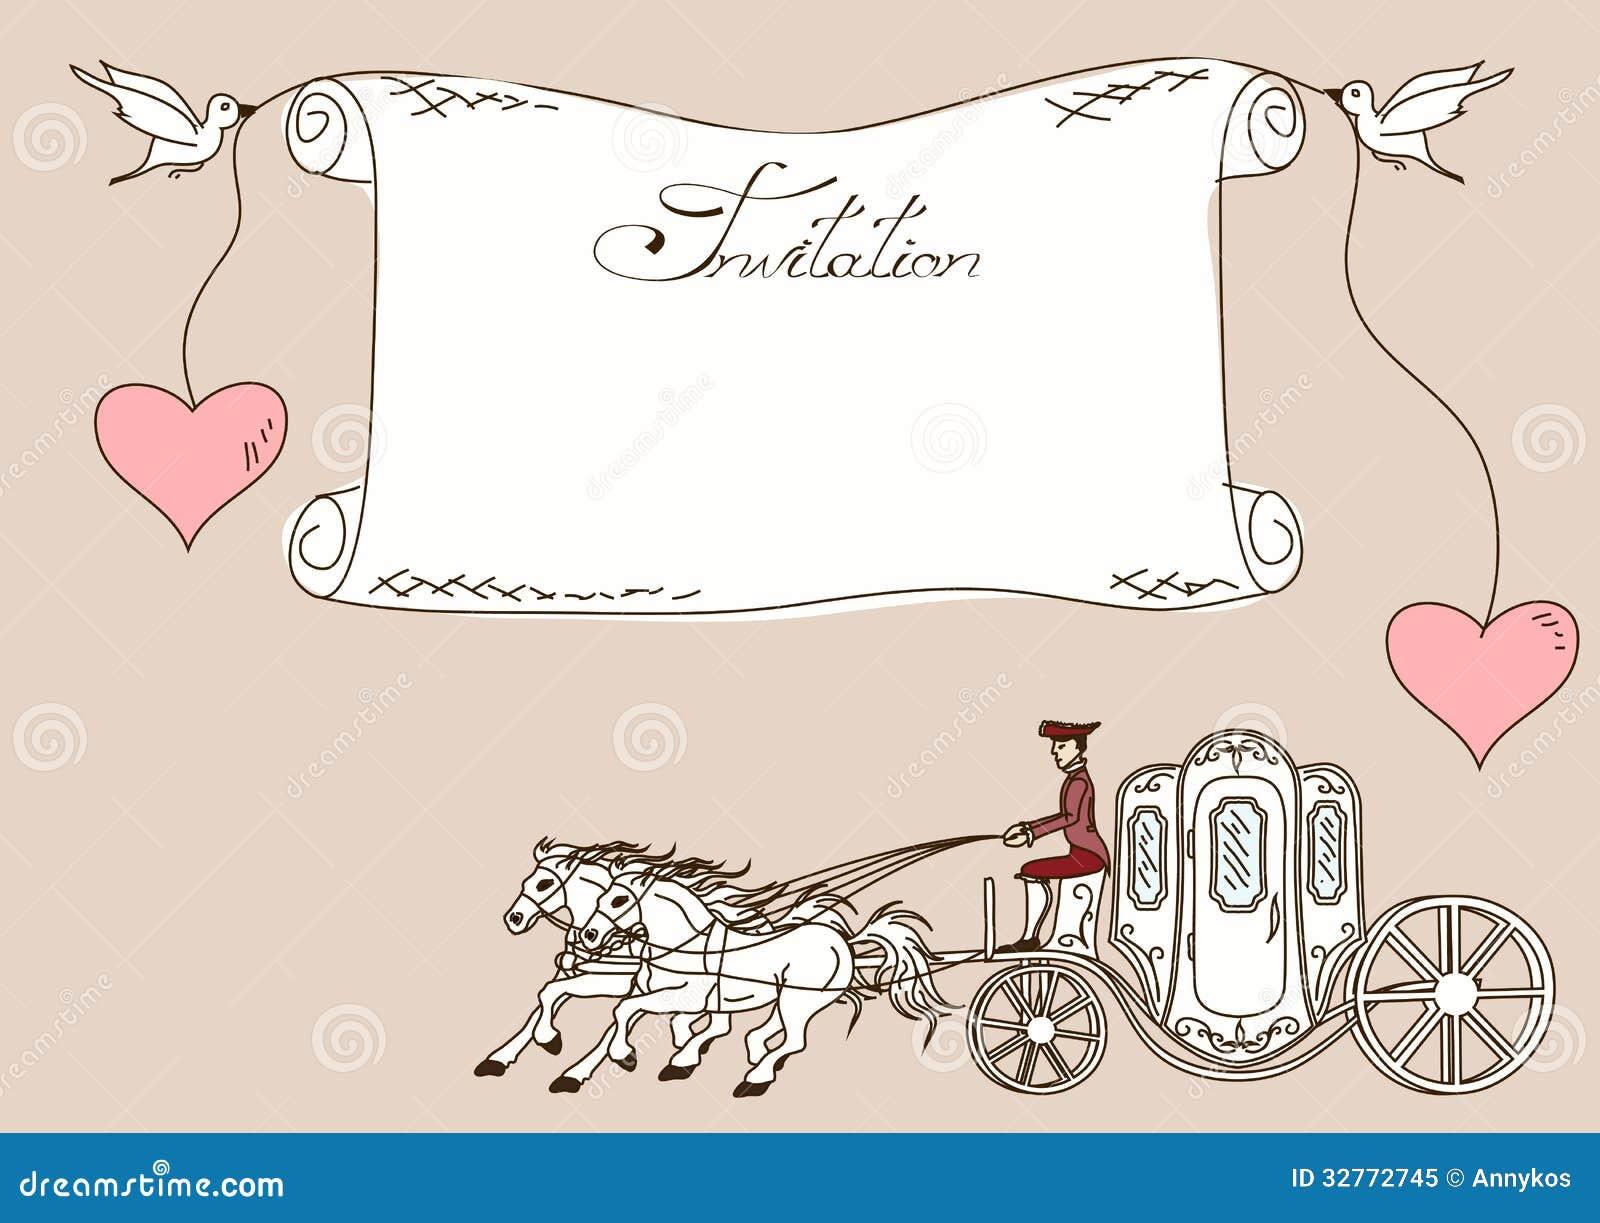 Wedding Celebration Invitations is amazing invitations ideas